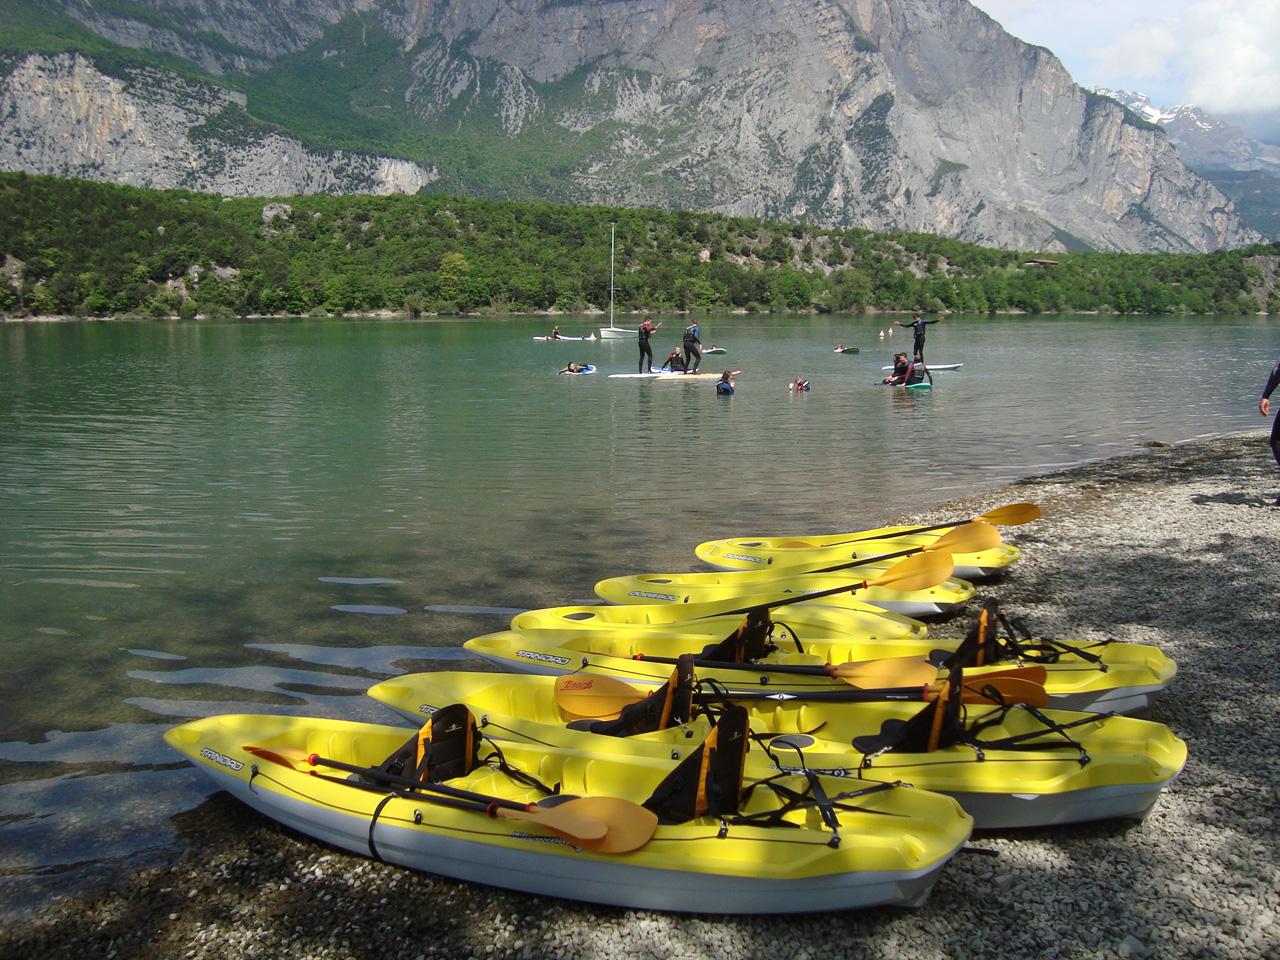 windvalley-surf-center-lago-di-cavedine-sport-vela-kayak (12)